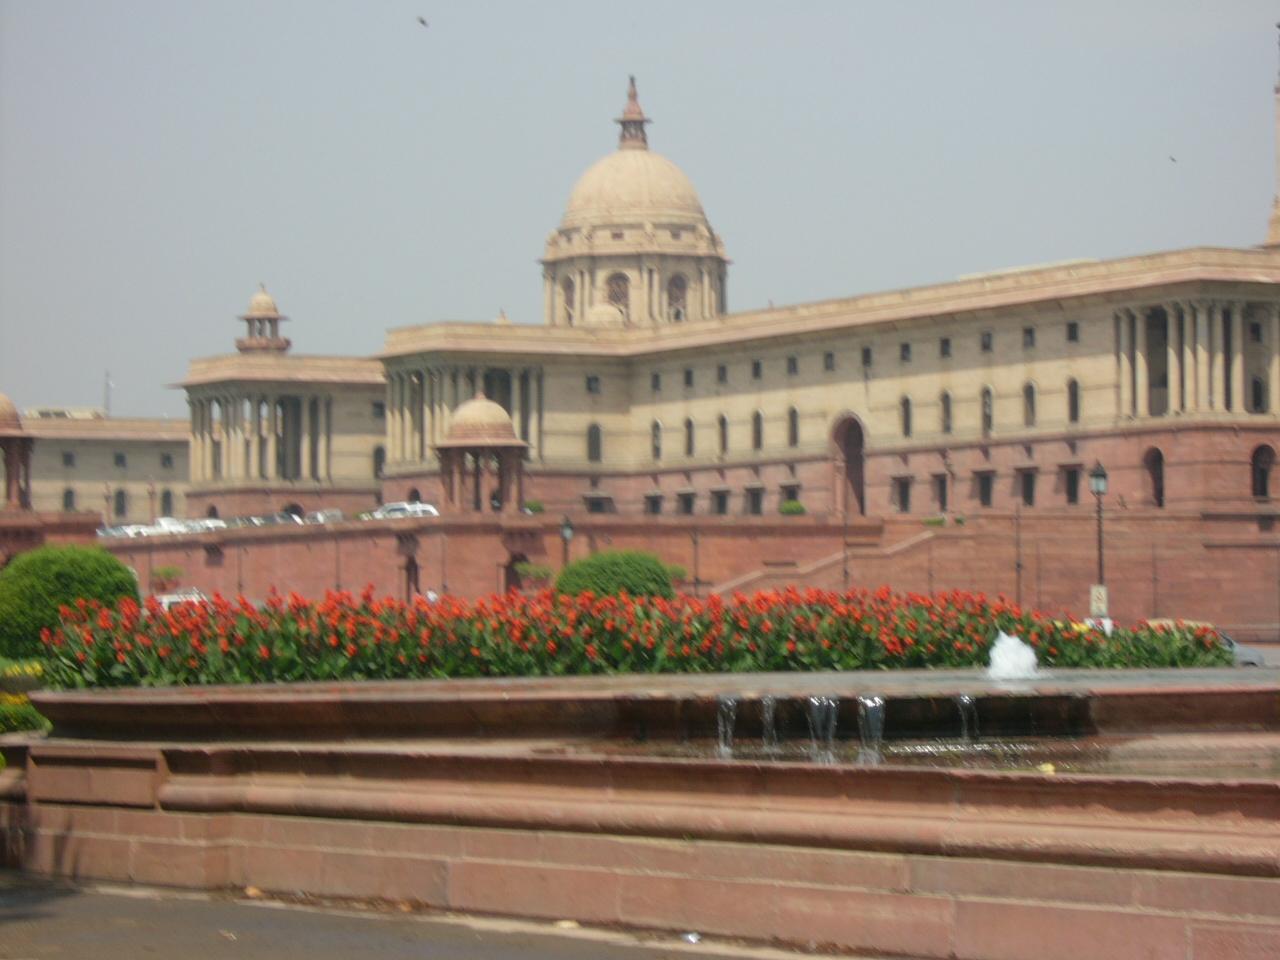 File:Indian Parliament Building Delhi India (3).JPG